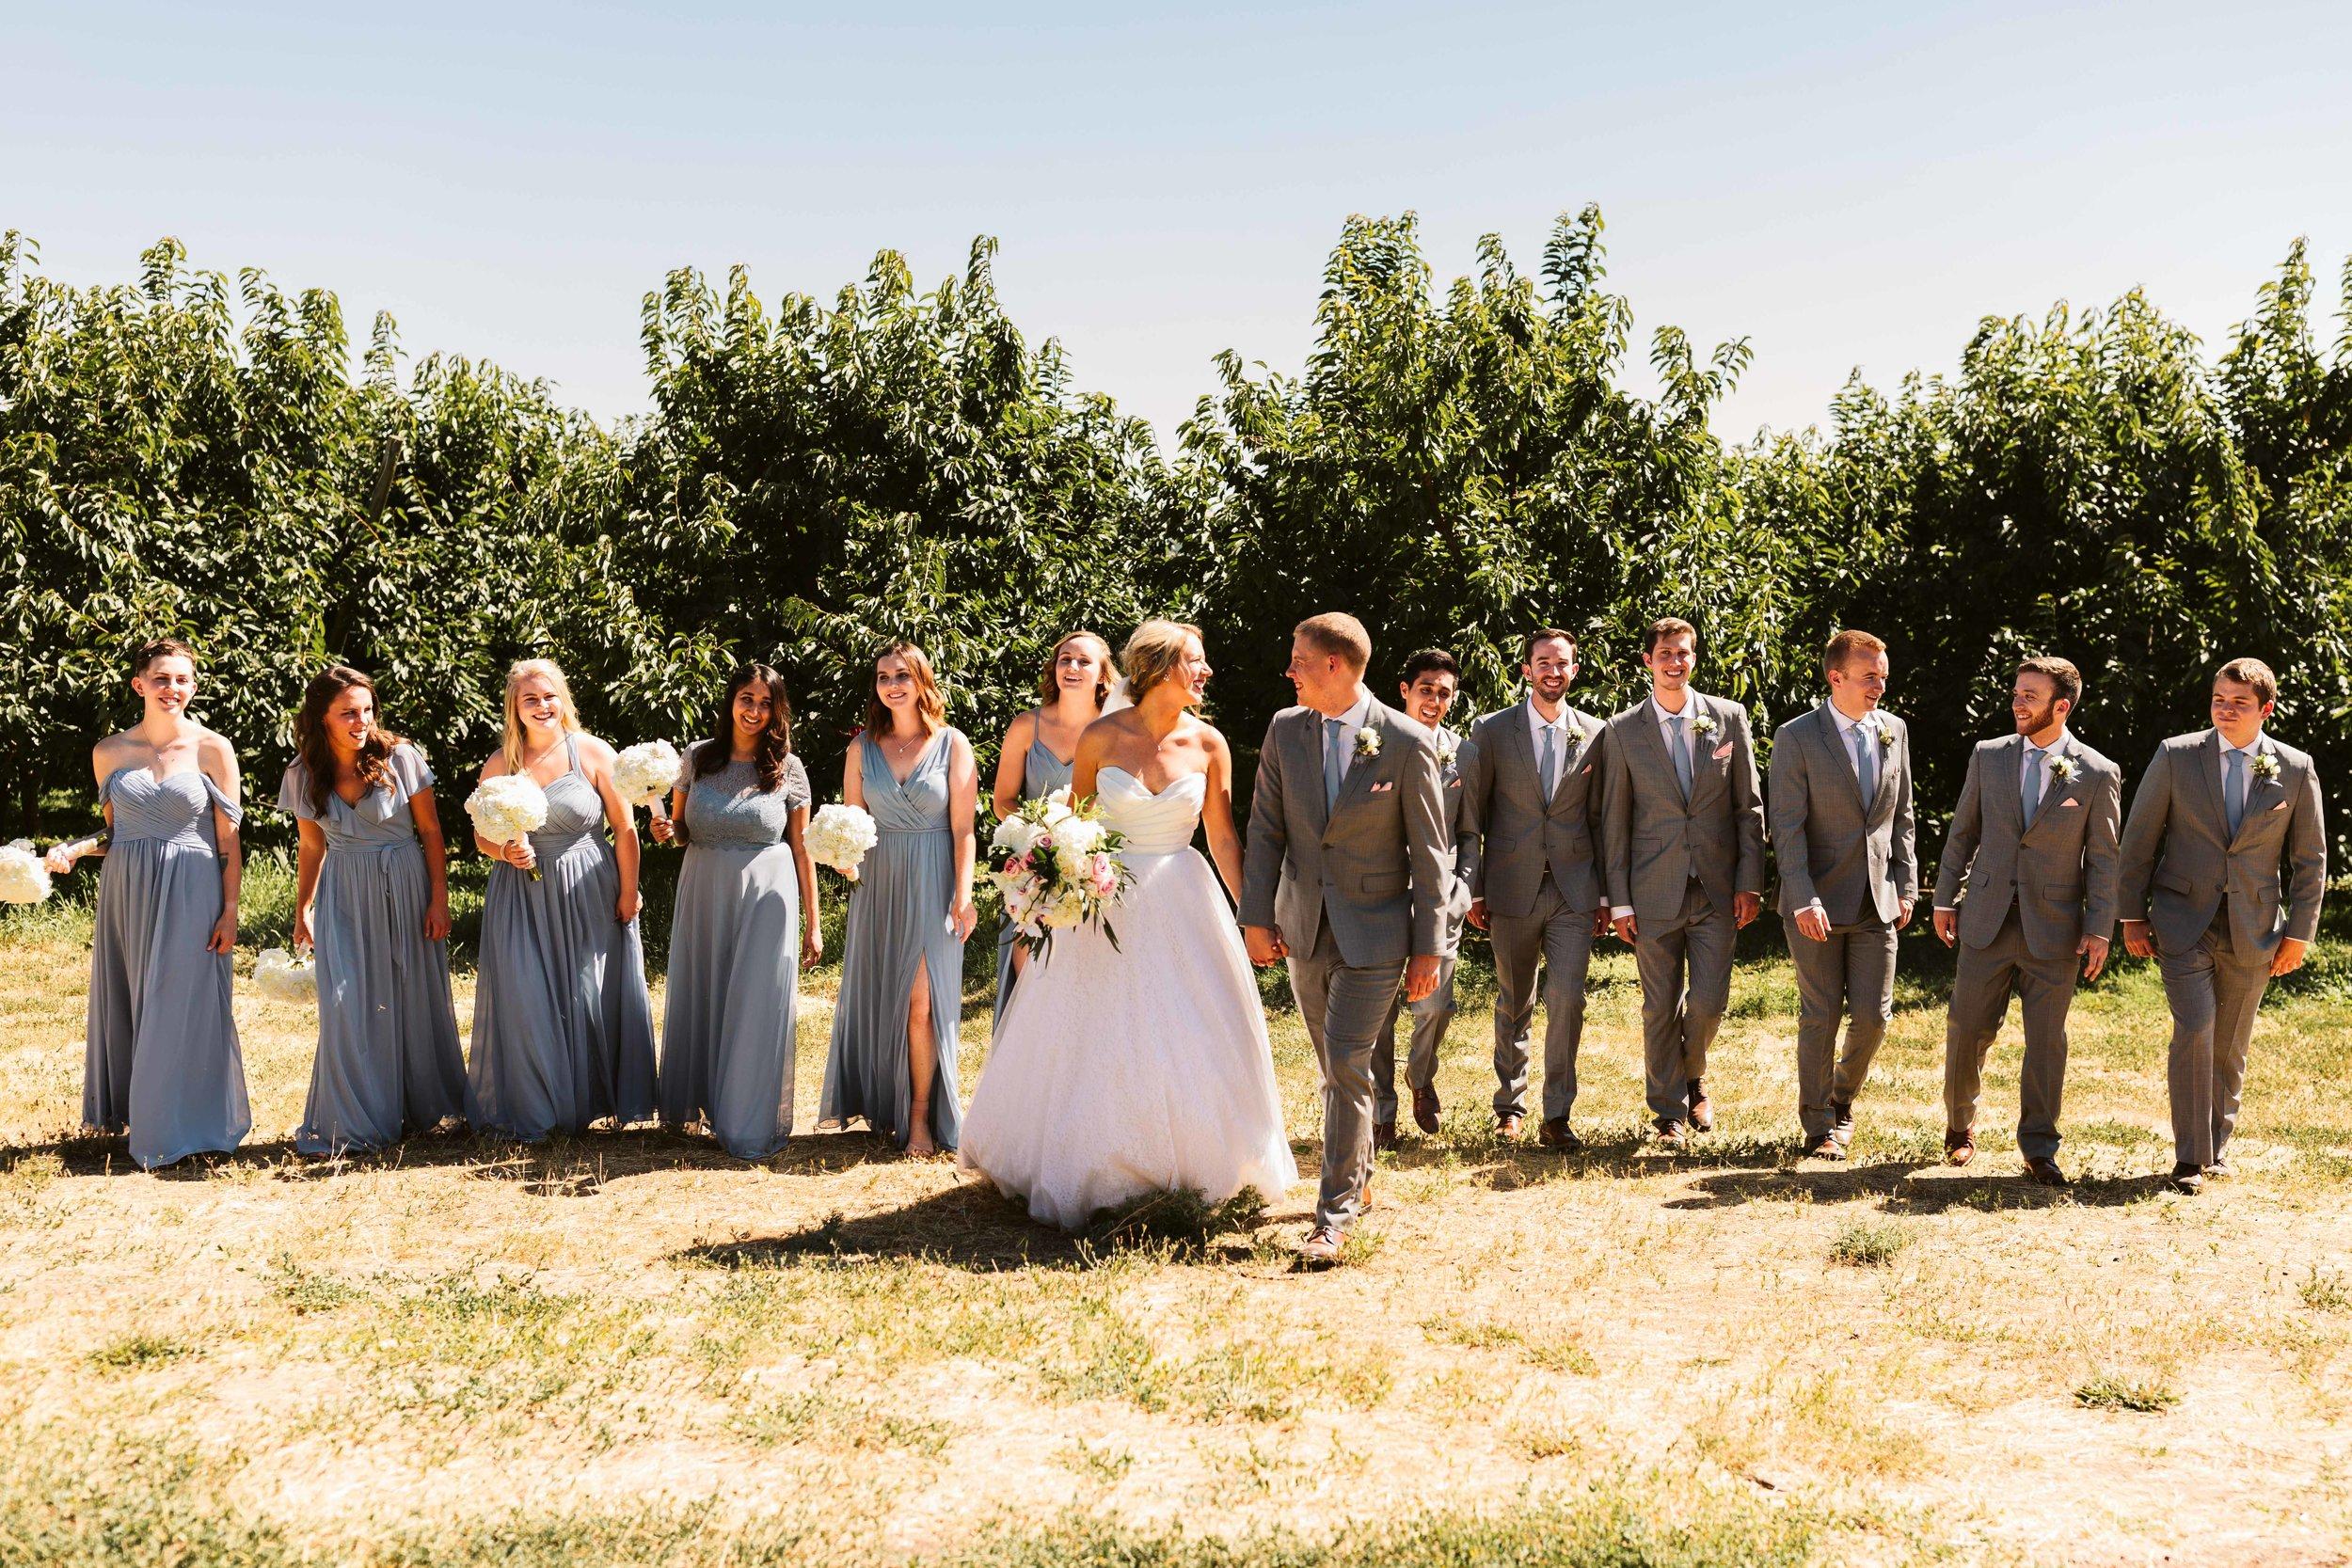 fontaine-estates-wedding-45.jpg